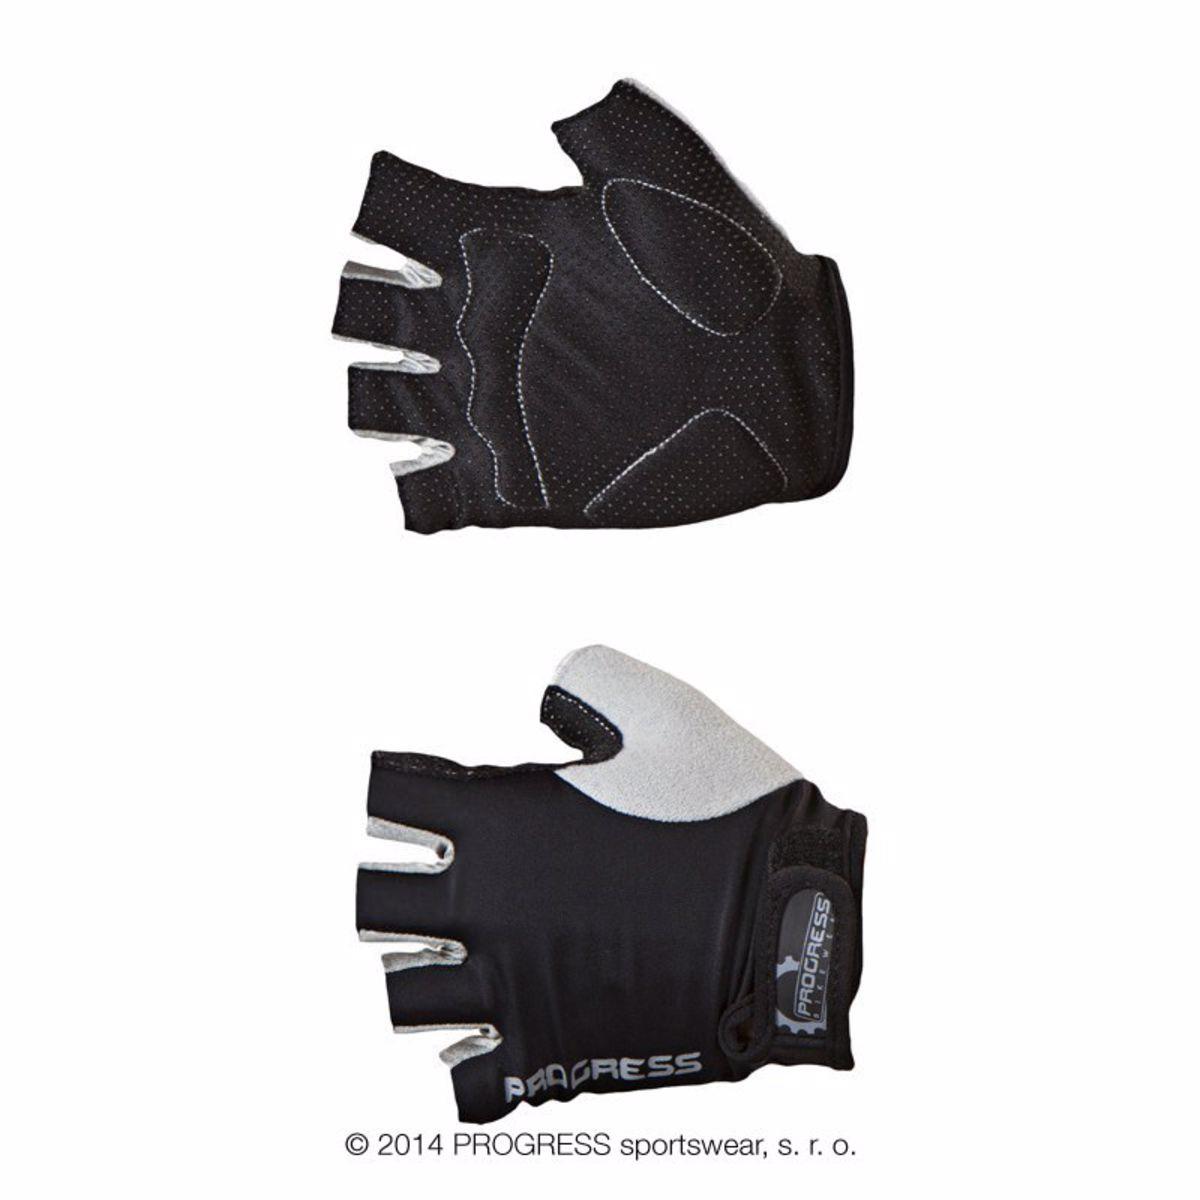 40f9f55c089 Progress R SIMPLE MITTS cyklistické rukavice